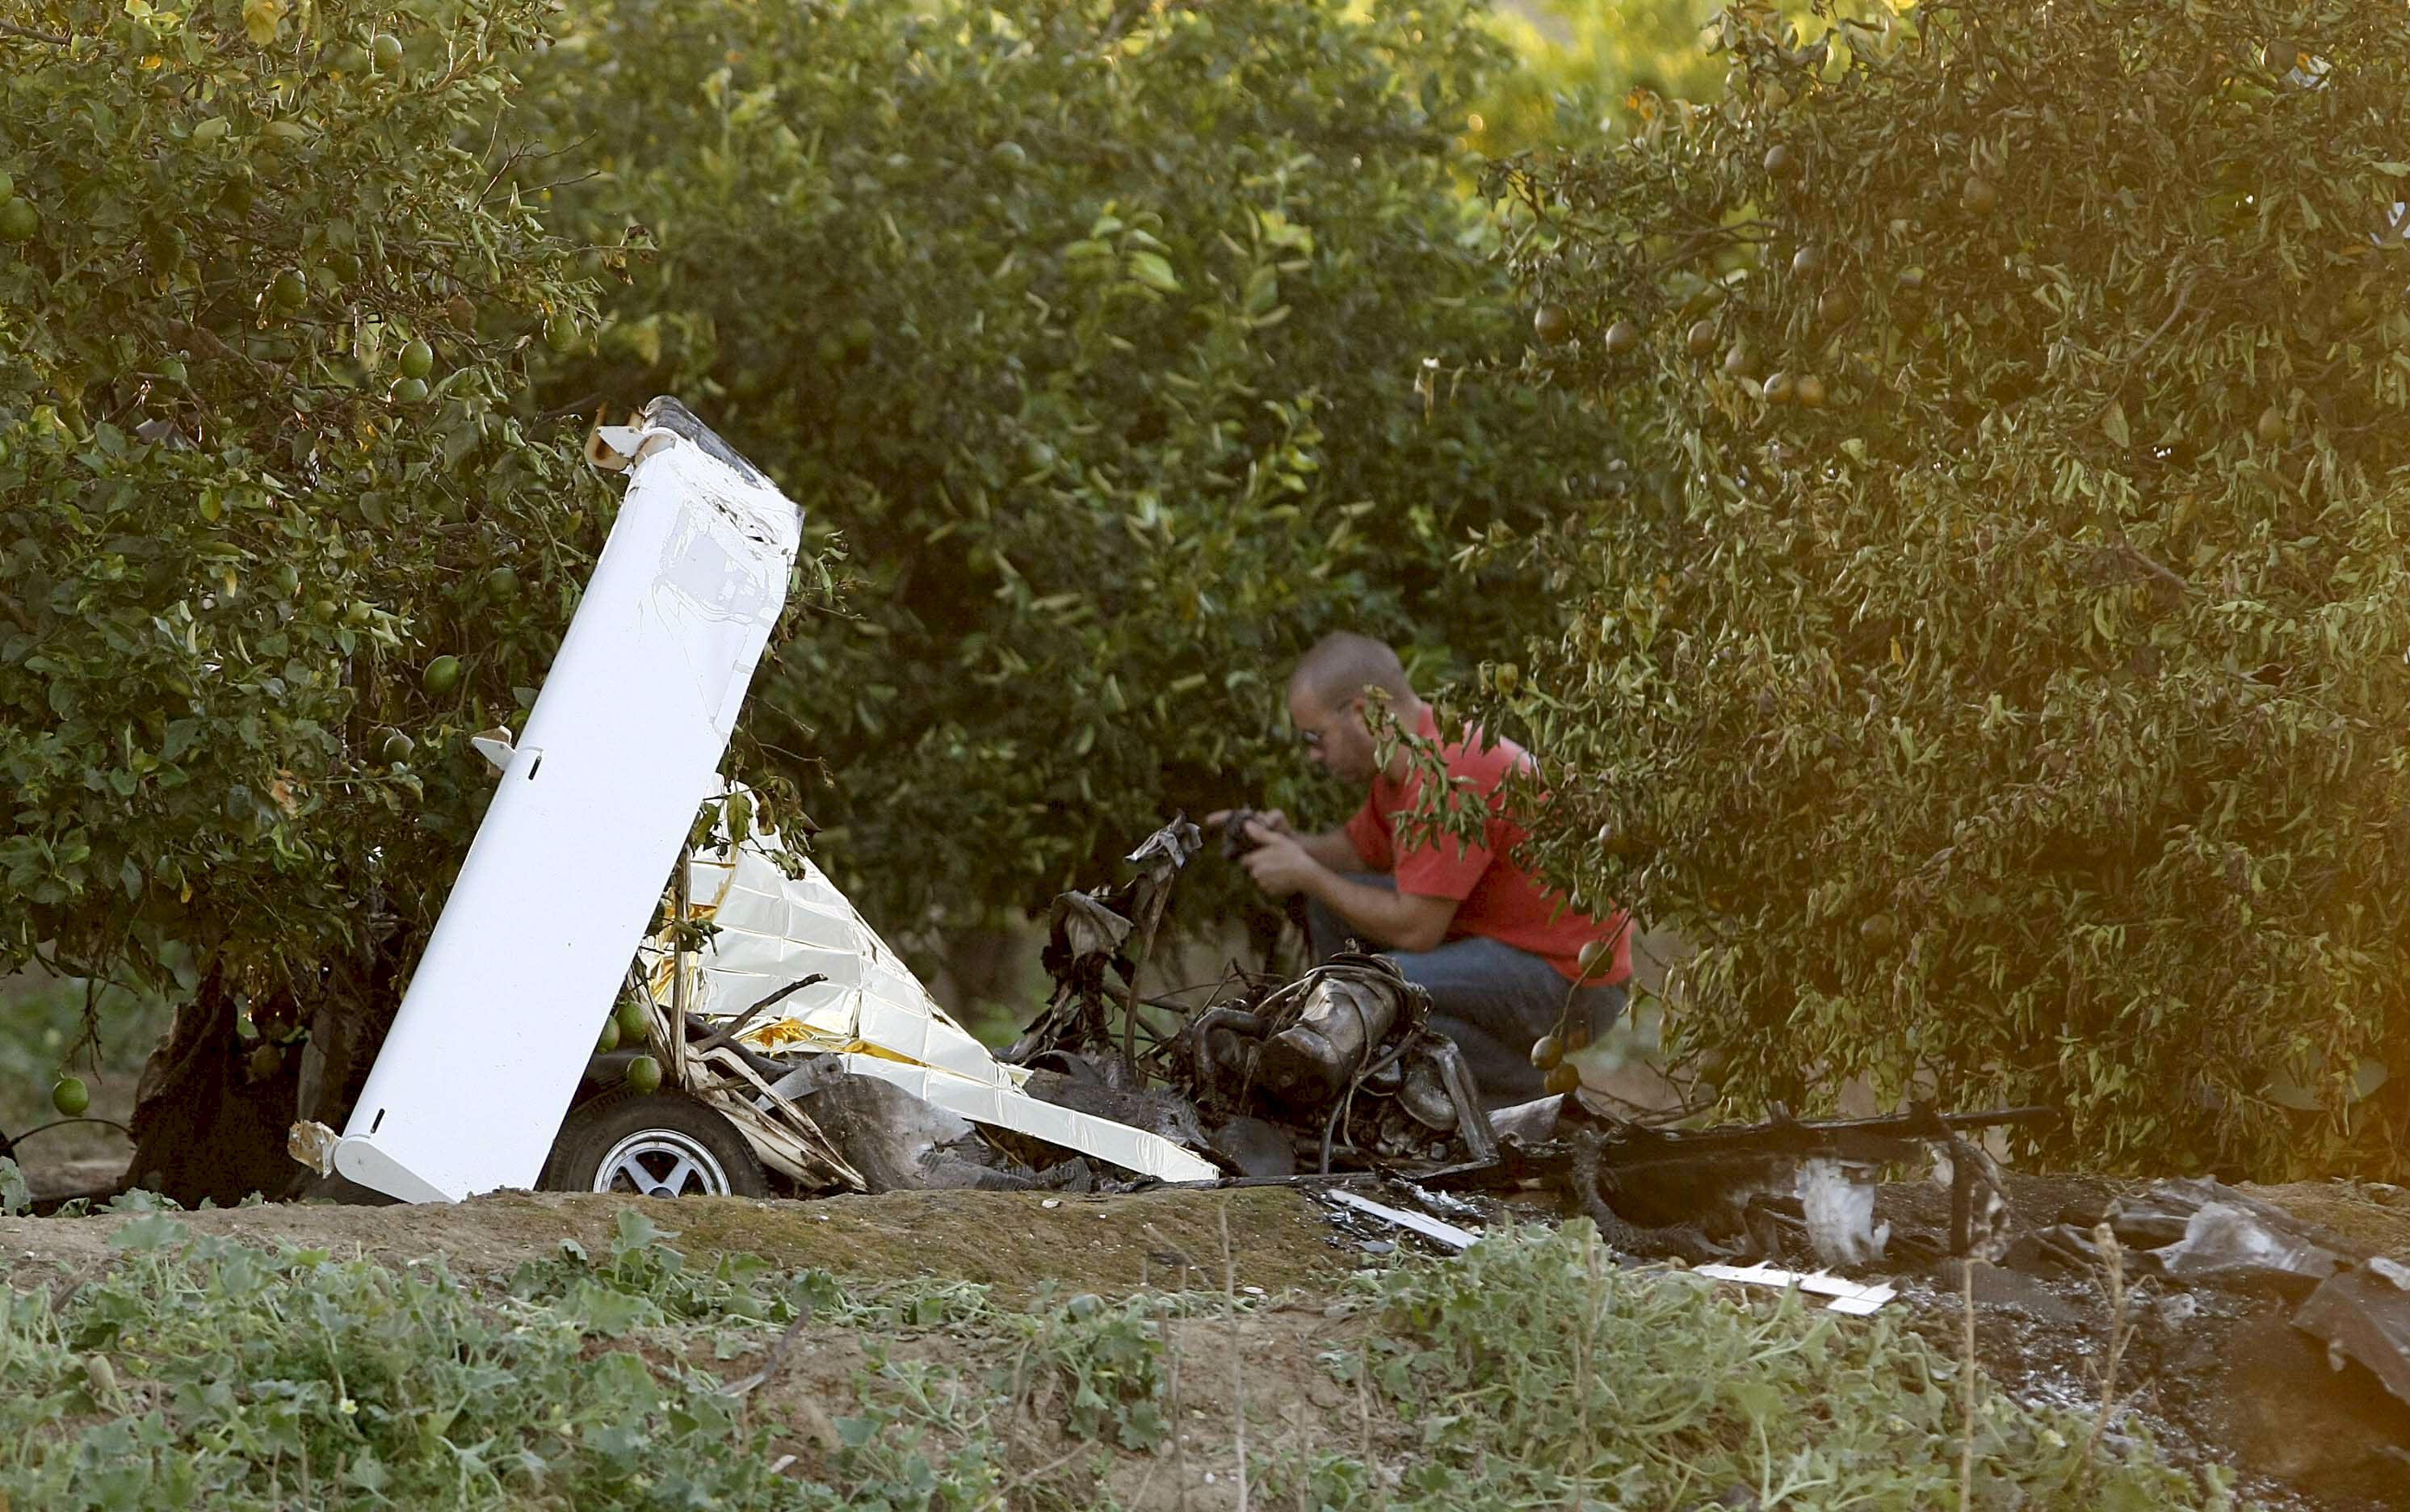 Mueren tres personas al estrellarse una avioneta en Mallorca